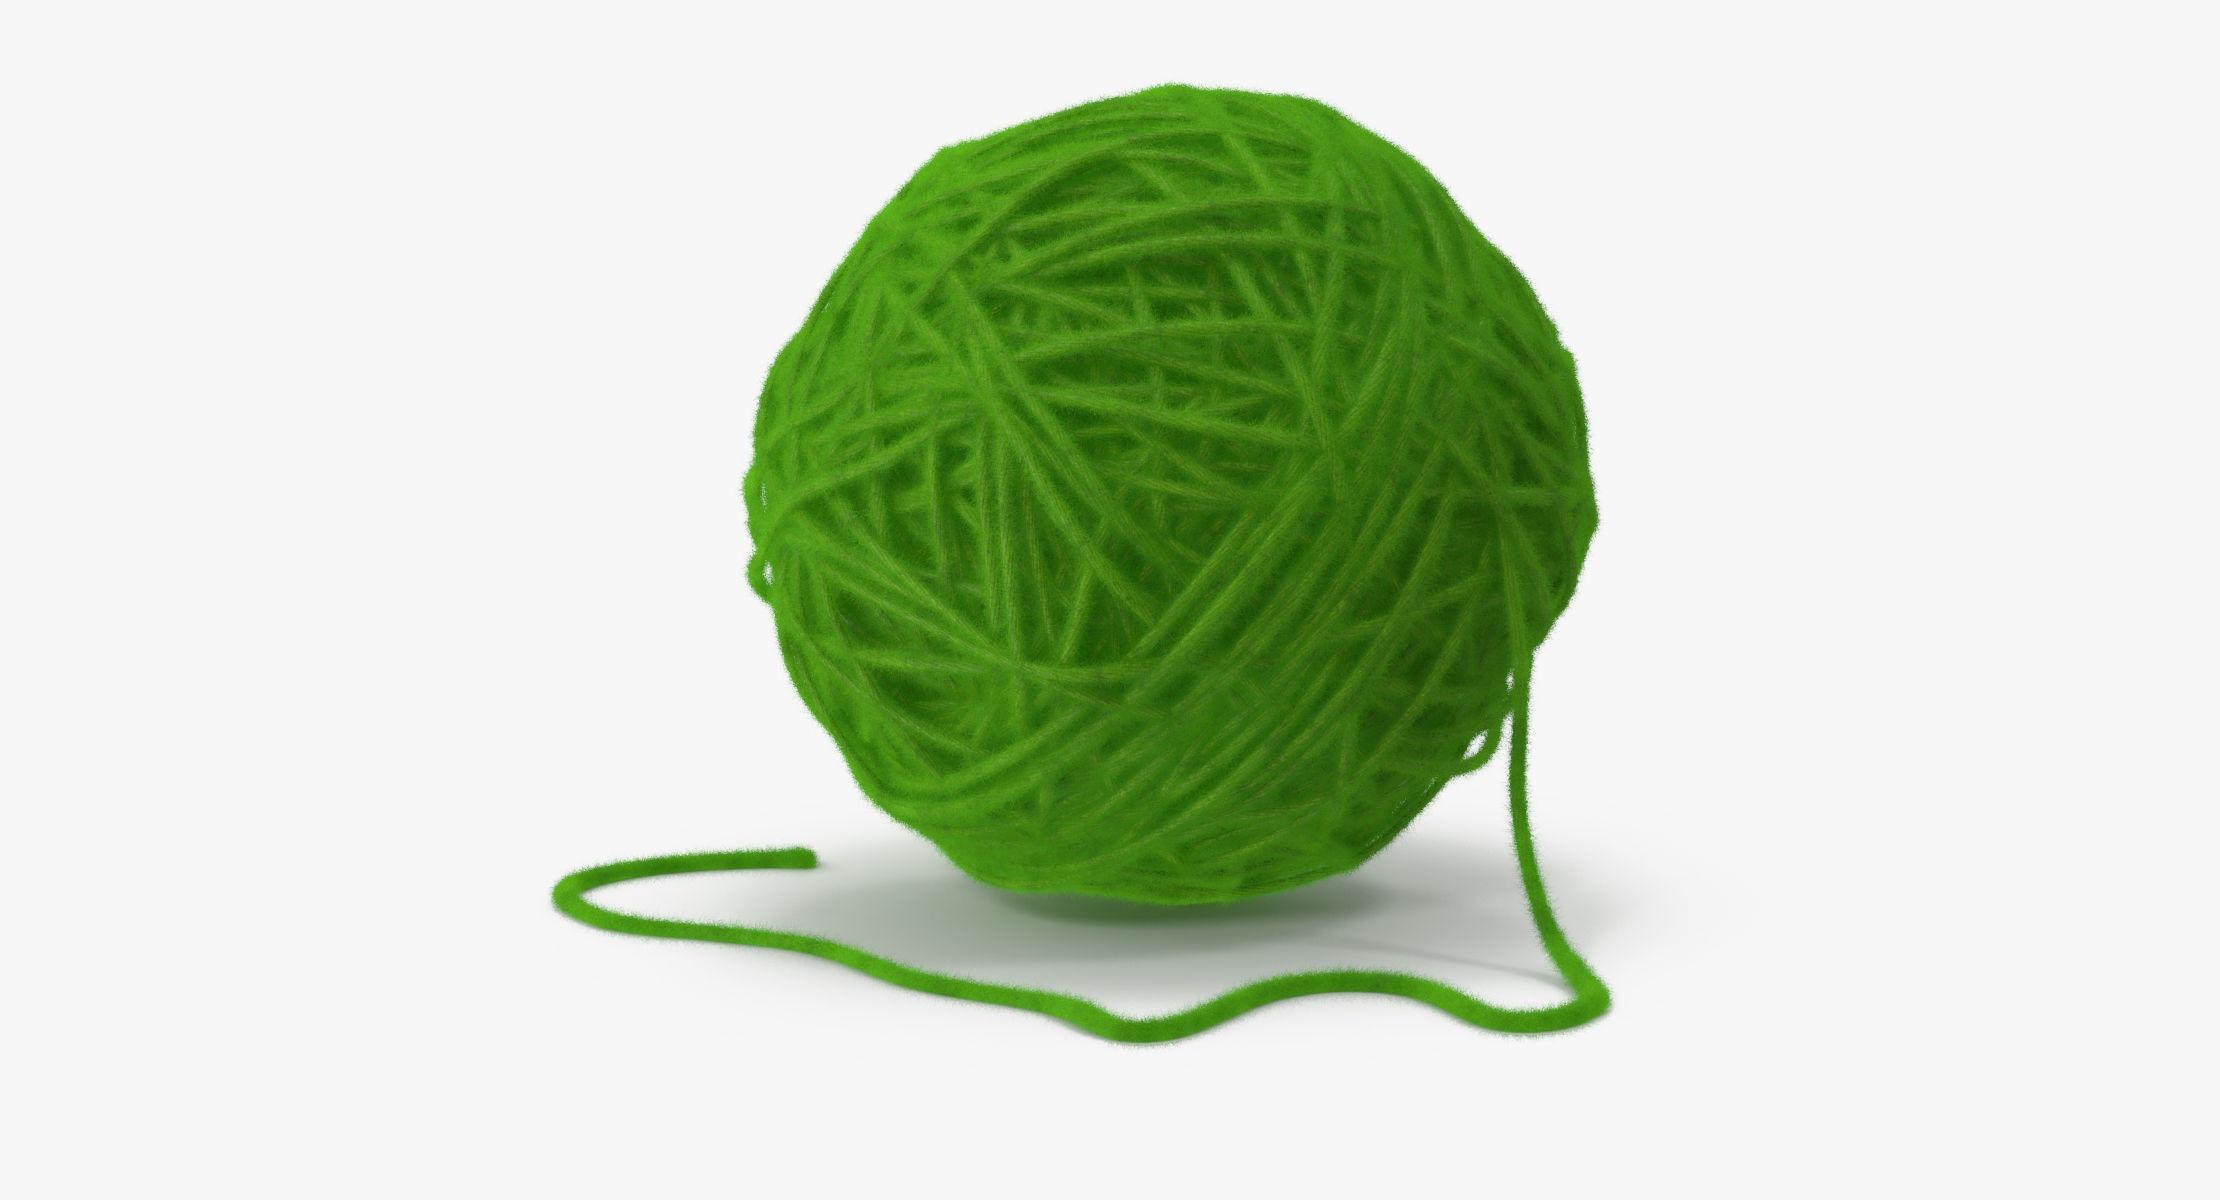 Ball of Yarn Green - reel 1